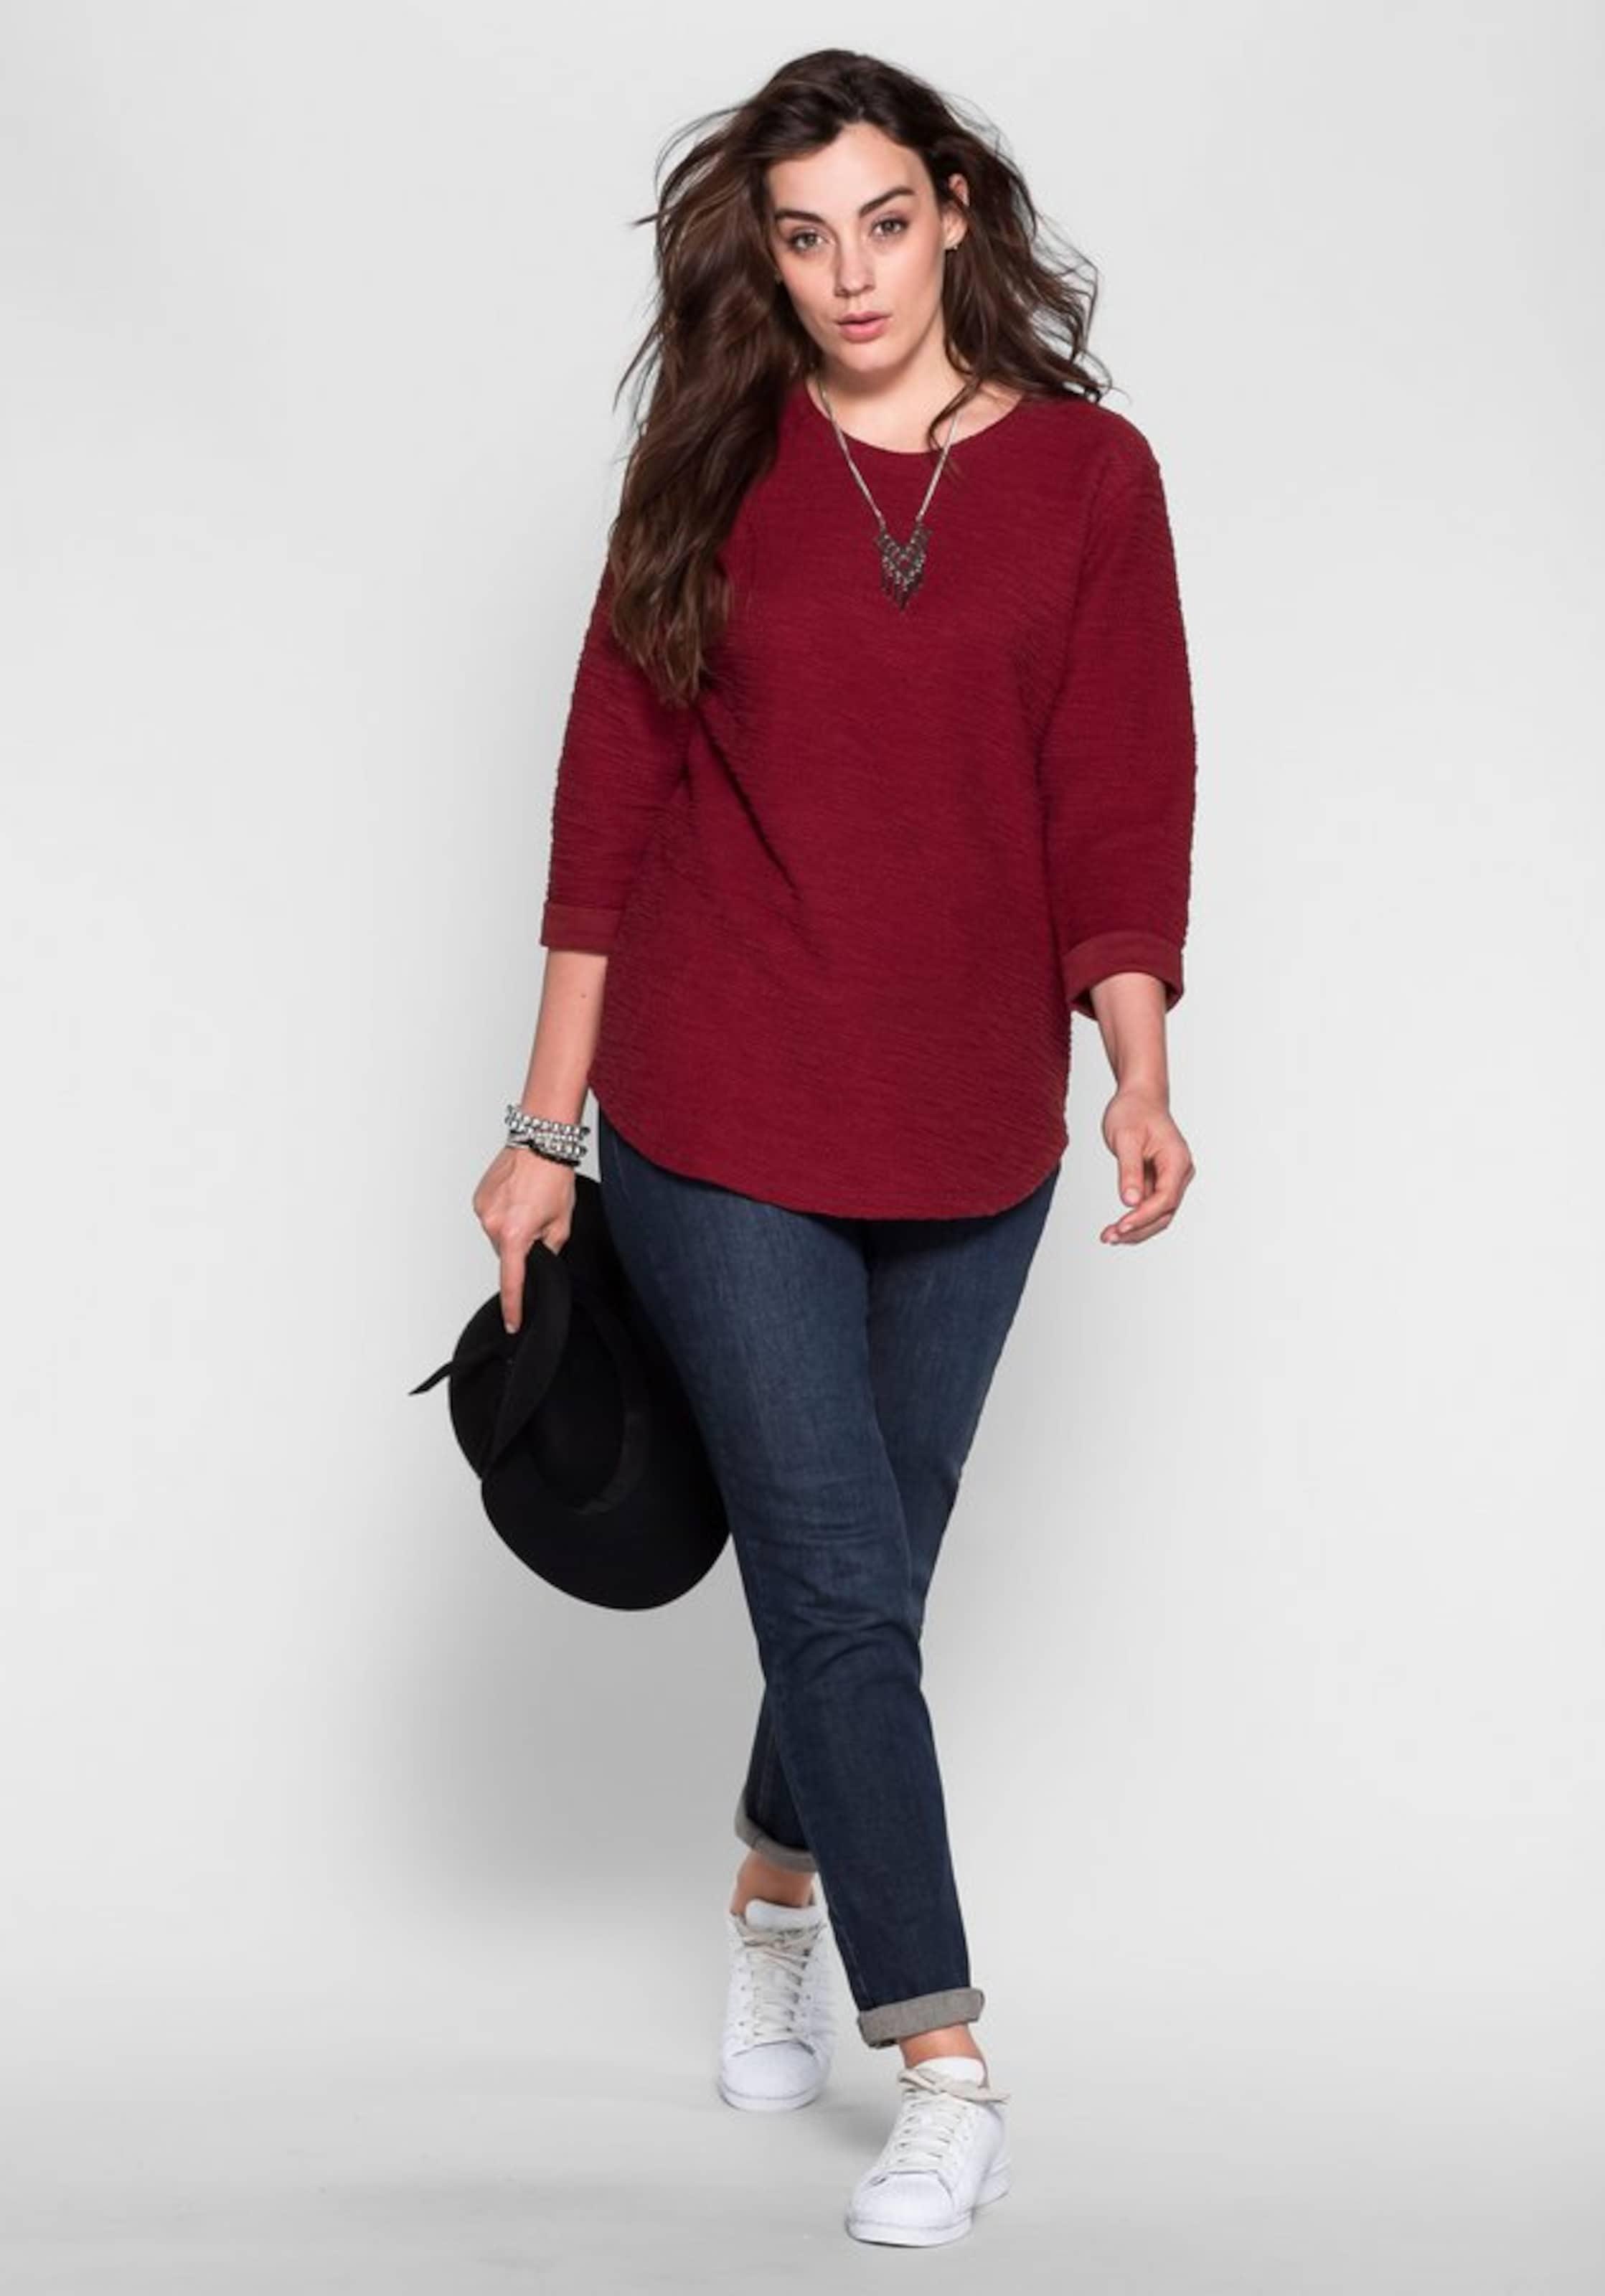 Rabatt Erschwinglich sheego casual Sweatshirt Steckdose Billig Authentisch Outlet Besten Großhandel Ofolg